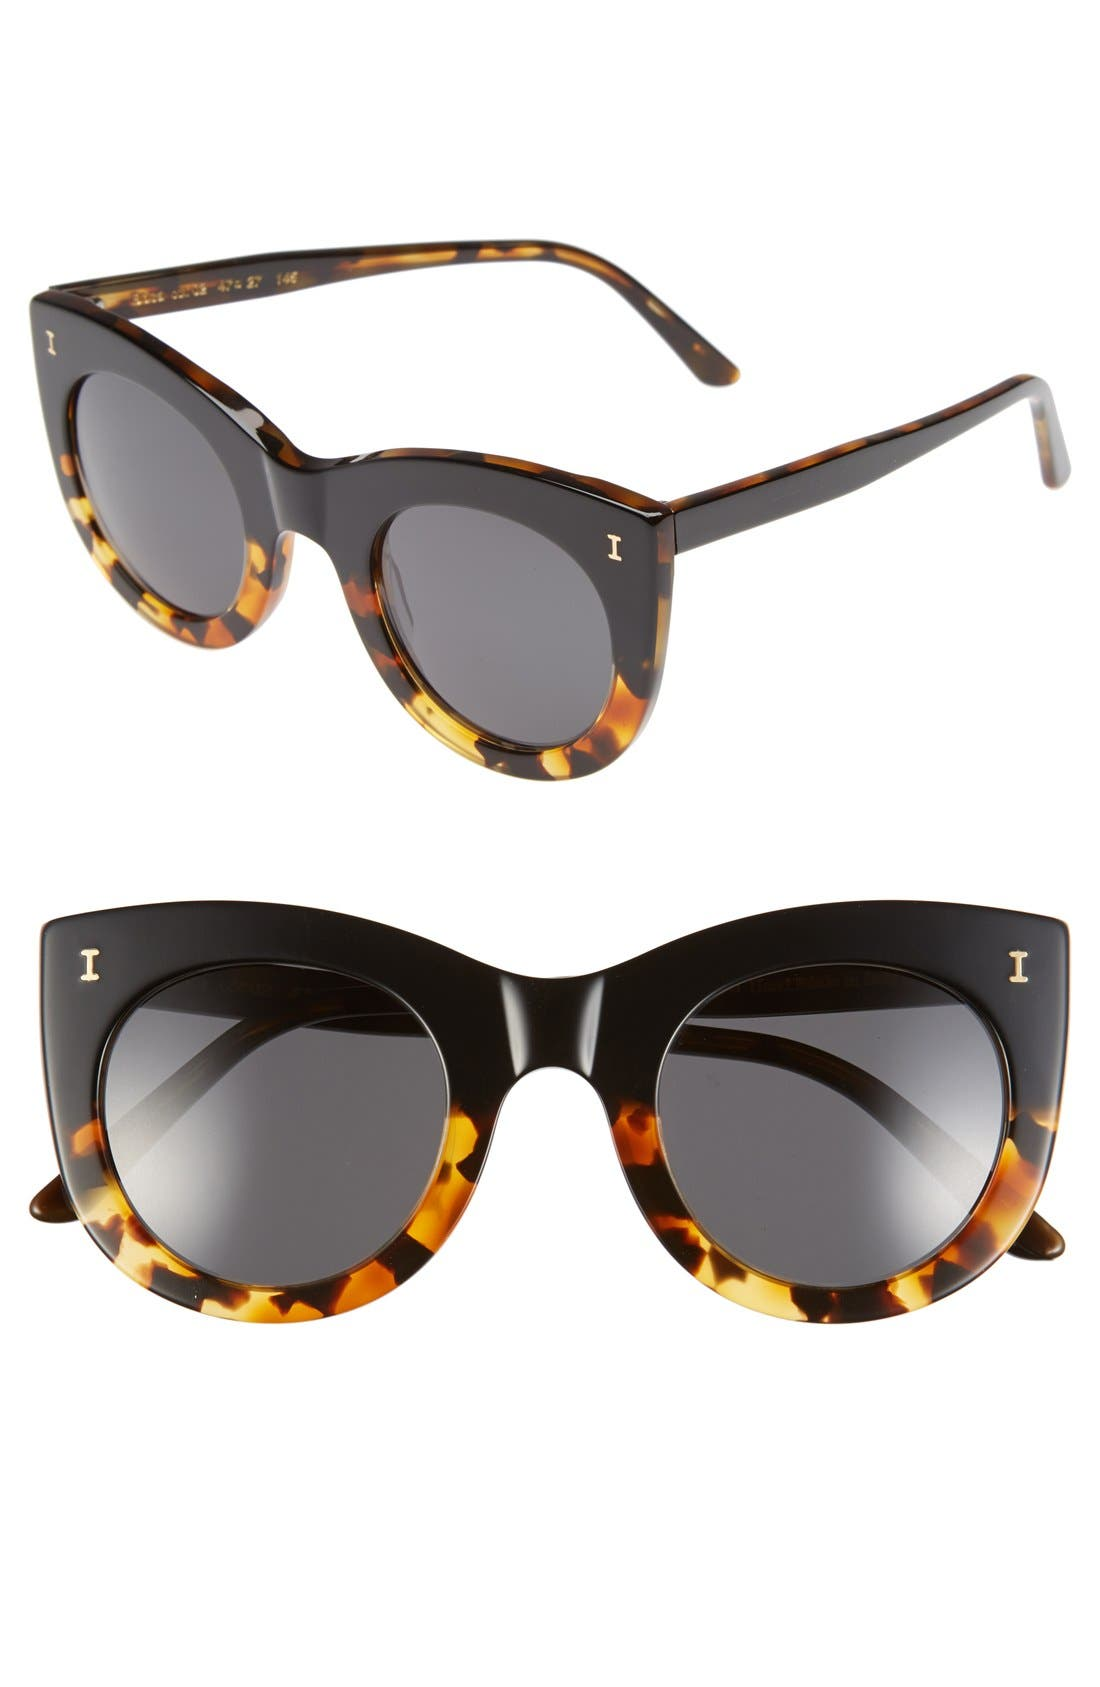 Alternate Image 1 Selected - Illesteva 'Boca' 47mm Round Sunglasses